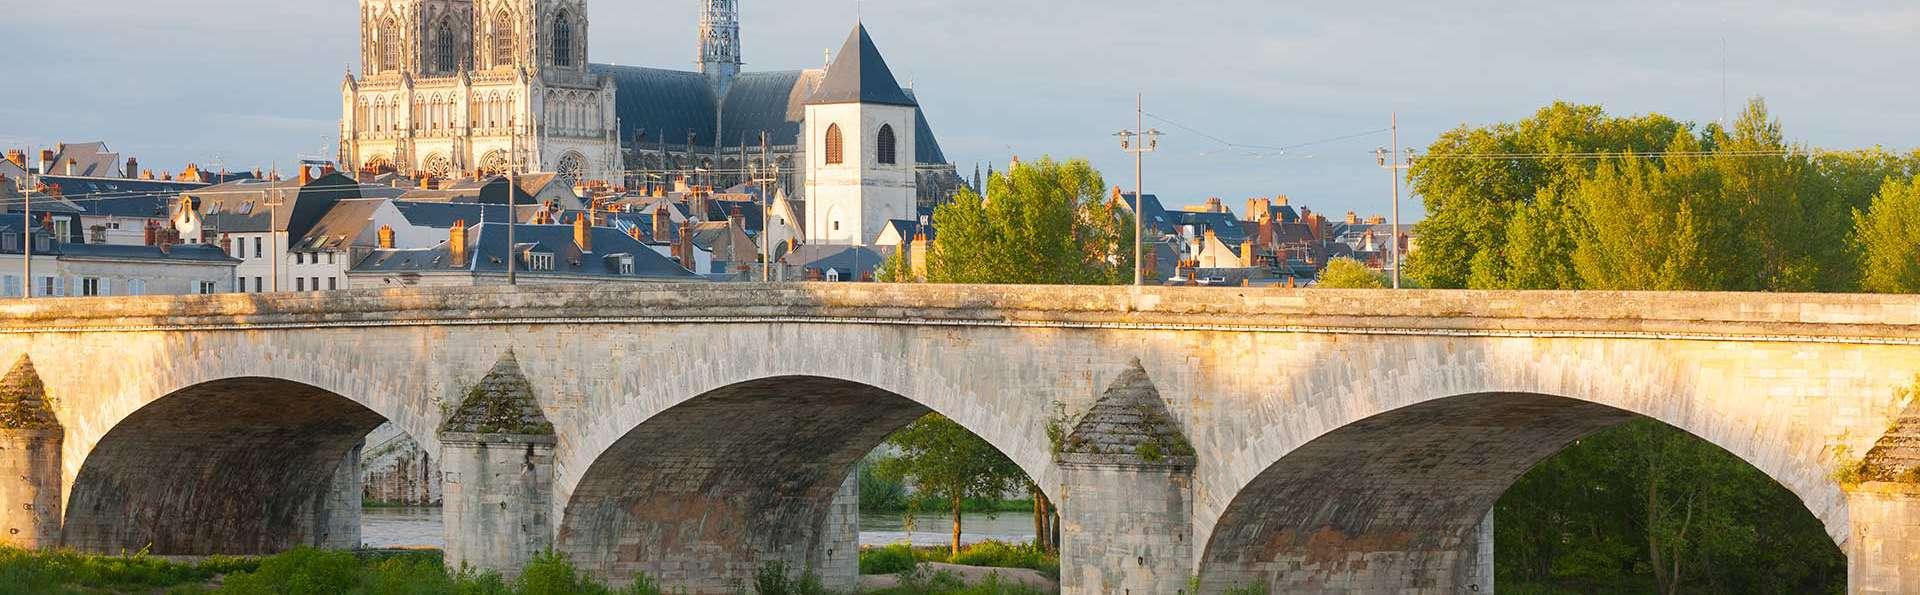 Novotel Orléans Saint-Jean-de-Braye - EDIT_DESTINATION_03.jpg